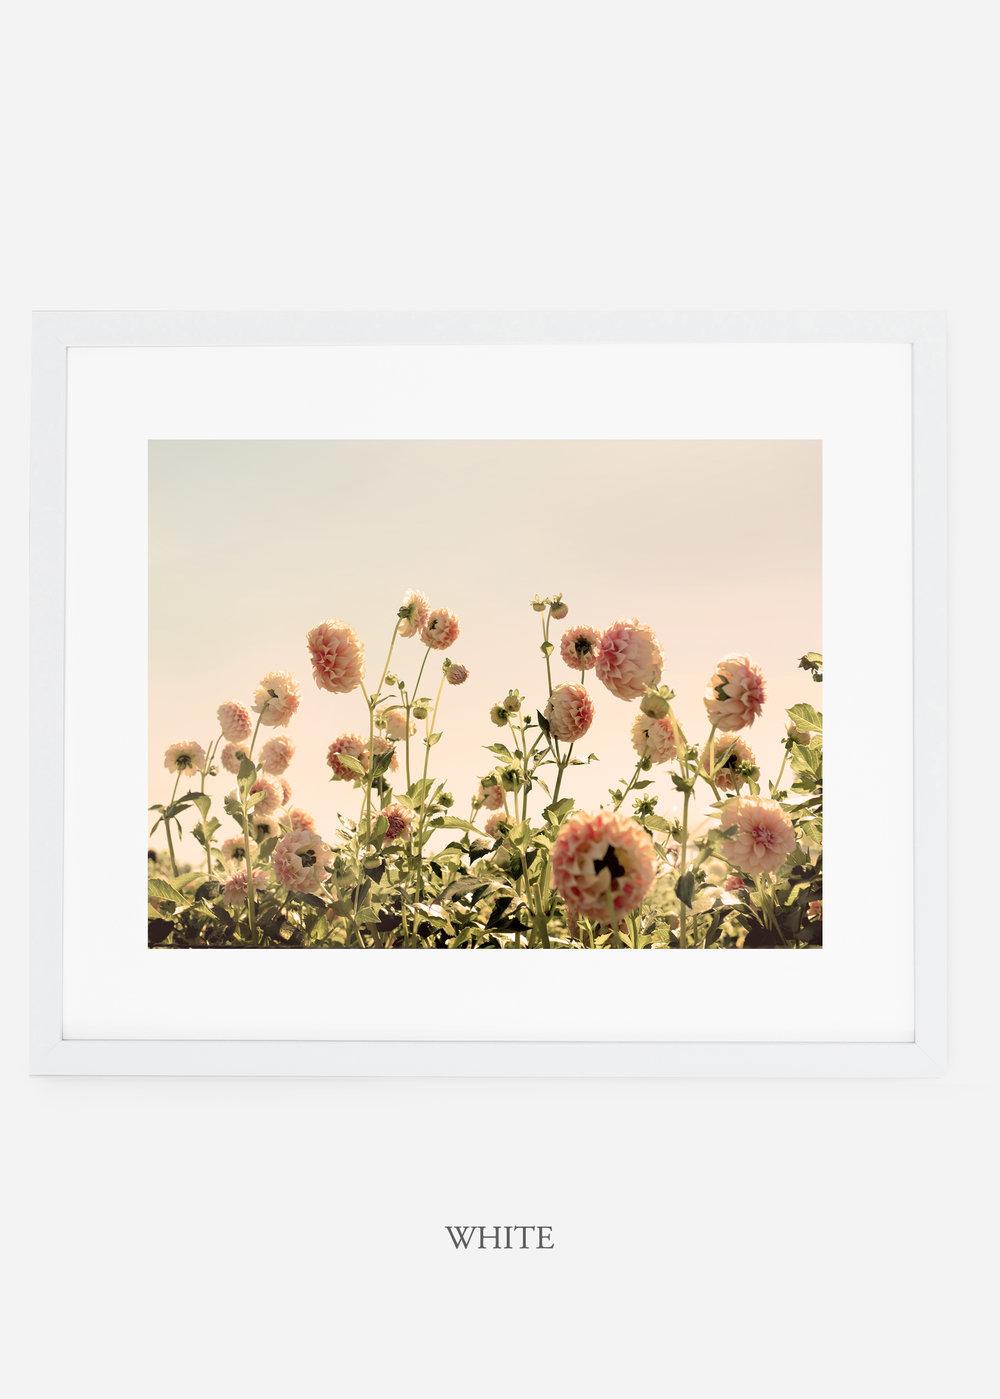 WhiteFrame_DahliaNo.1_WilderCalifornia_Art_Floral_Homedecor_Prints_Dahlia_Botanical_Artwork_Interiordesign.jpg